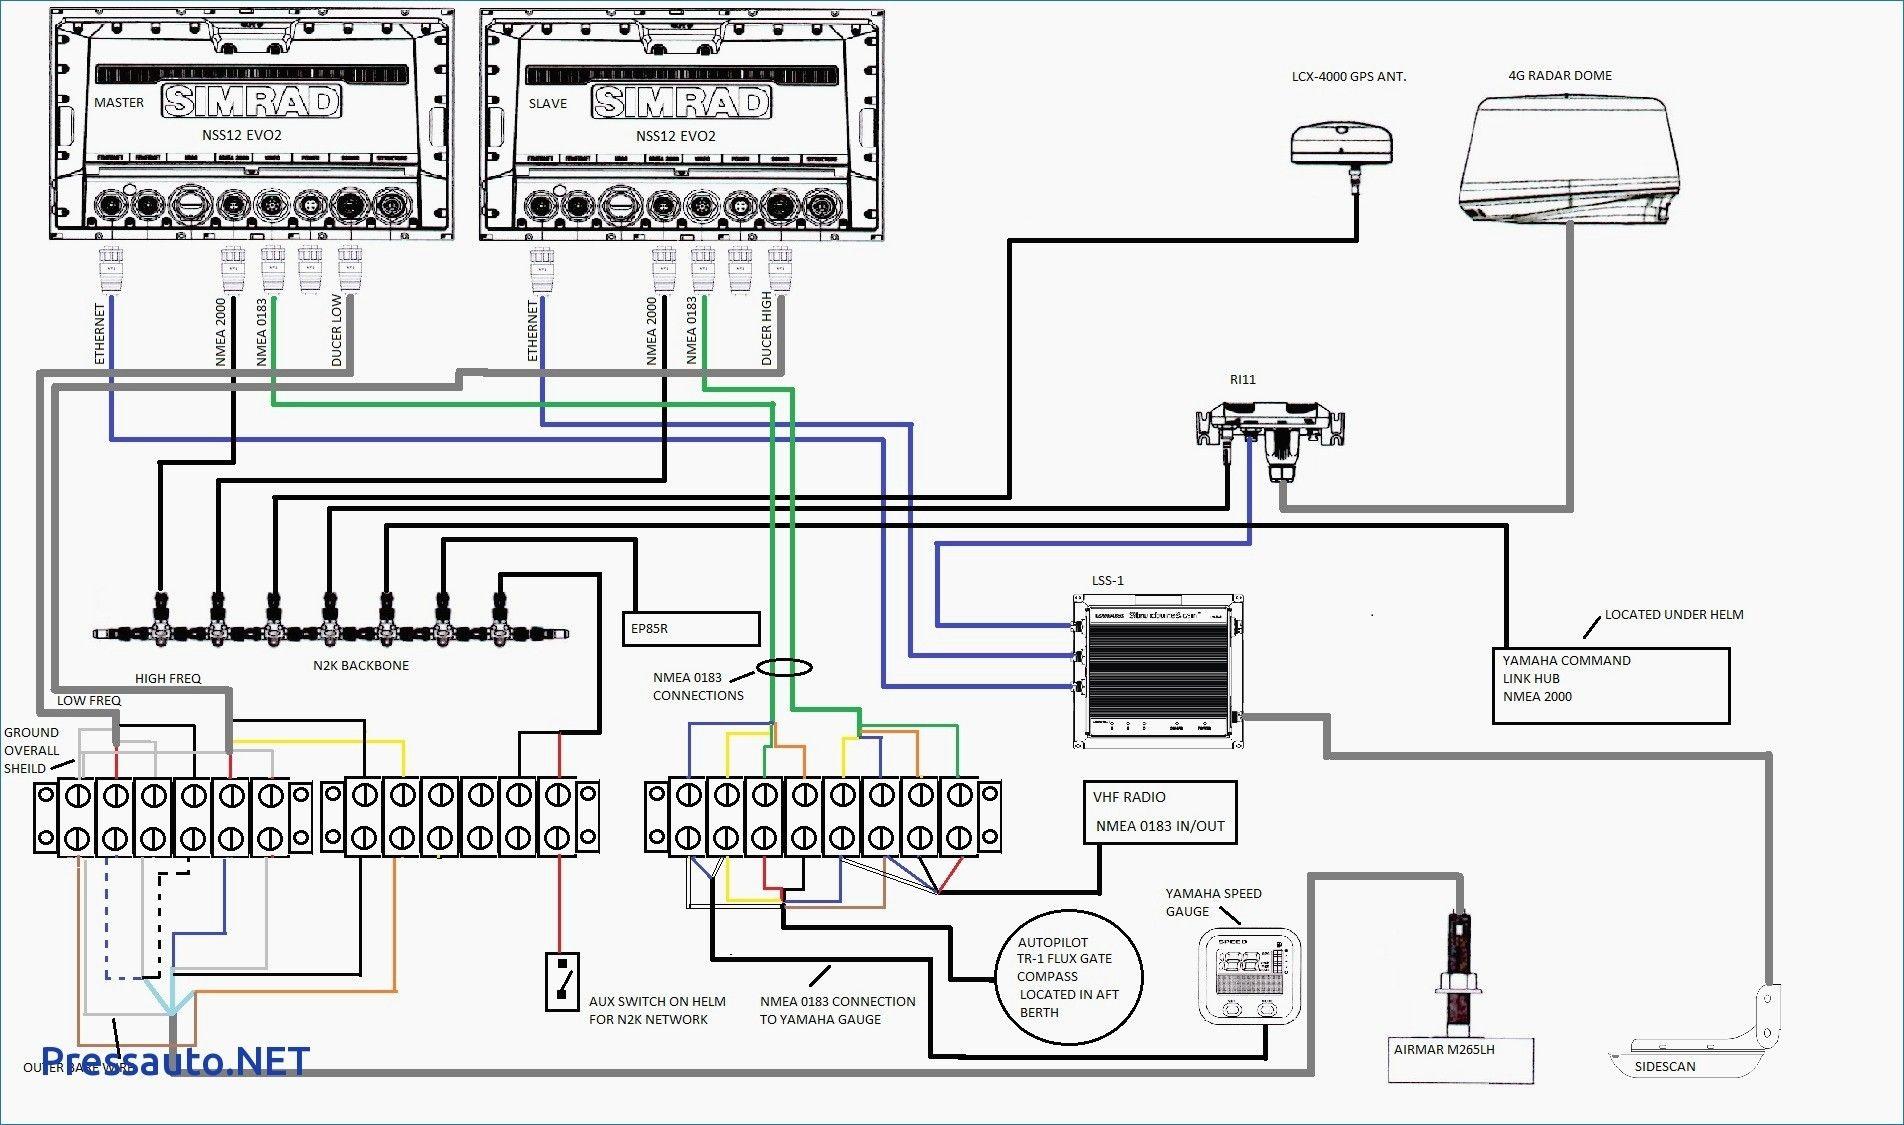 New Network Wiring Diagram diagram